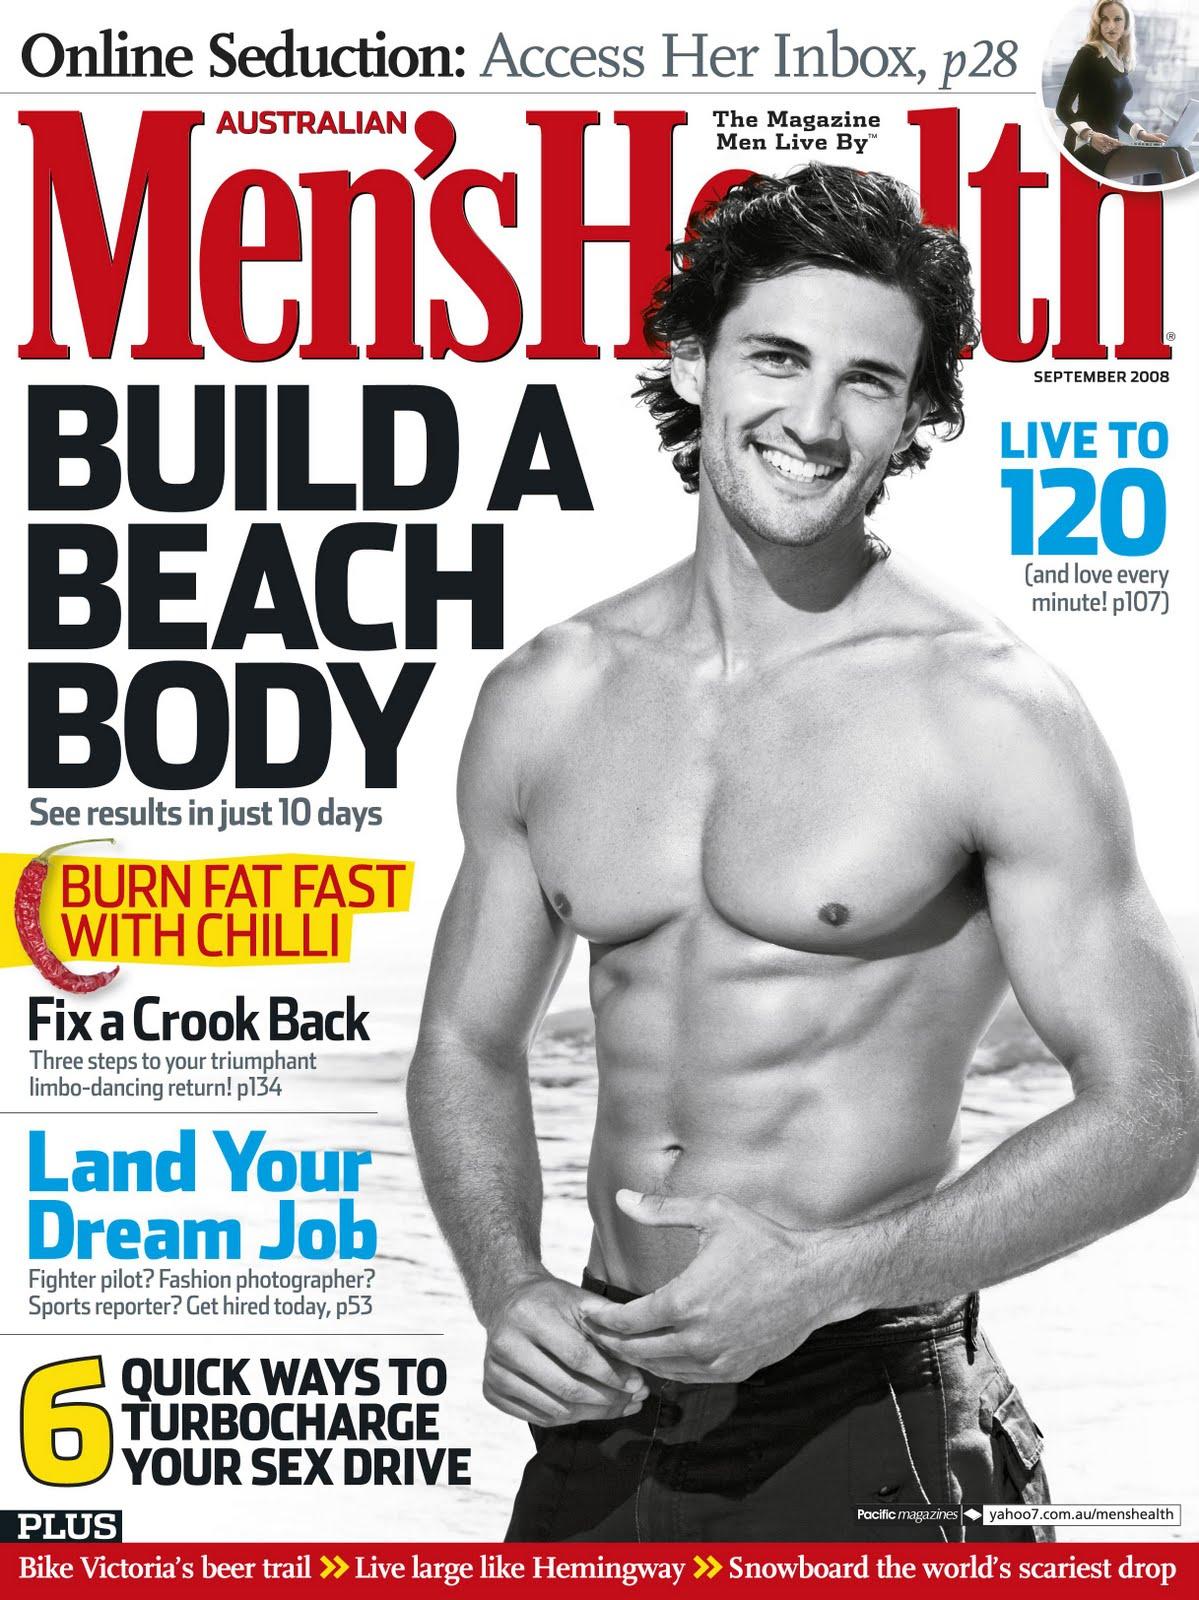 http://2.bp.blogspot.com/_ToOIEHay83M/S-KWRVWsaoI/AAAAAAAAACw/2i6wKL1C5BQ/s1600/mens-health-magazine1.jpg